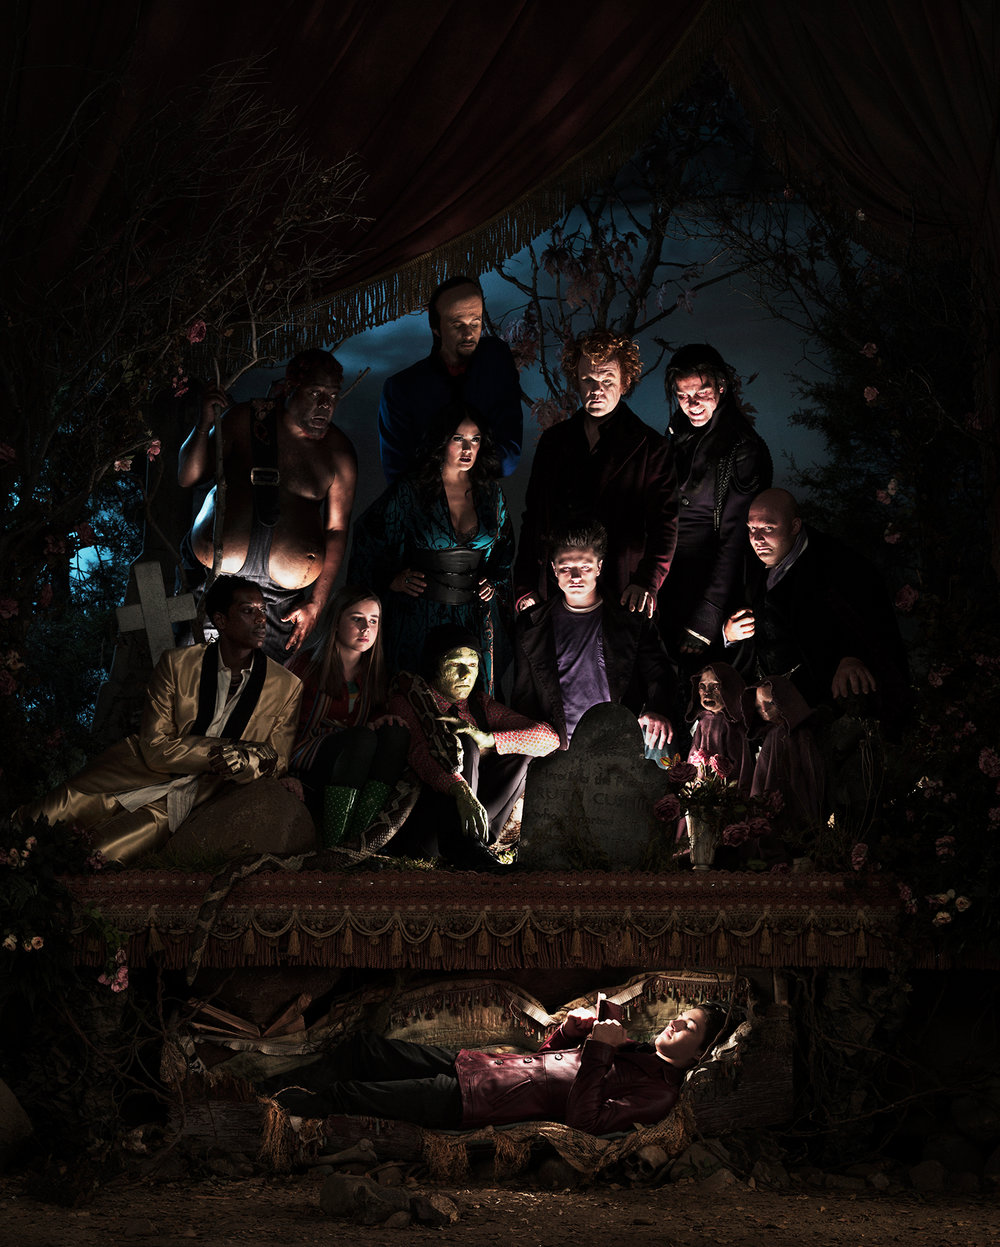 Universal Pictures - Cirque du Freak The Vampire's Assistant - Los Angeles, CA